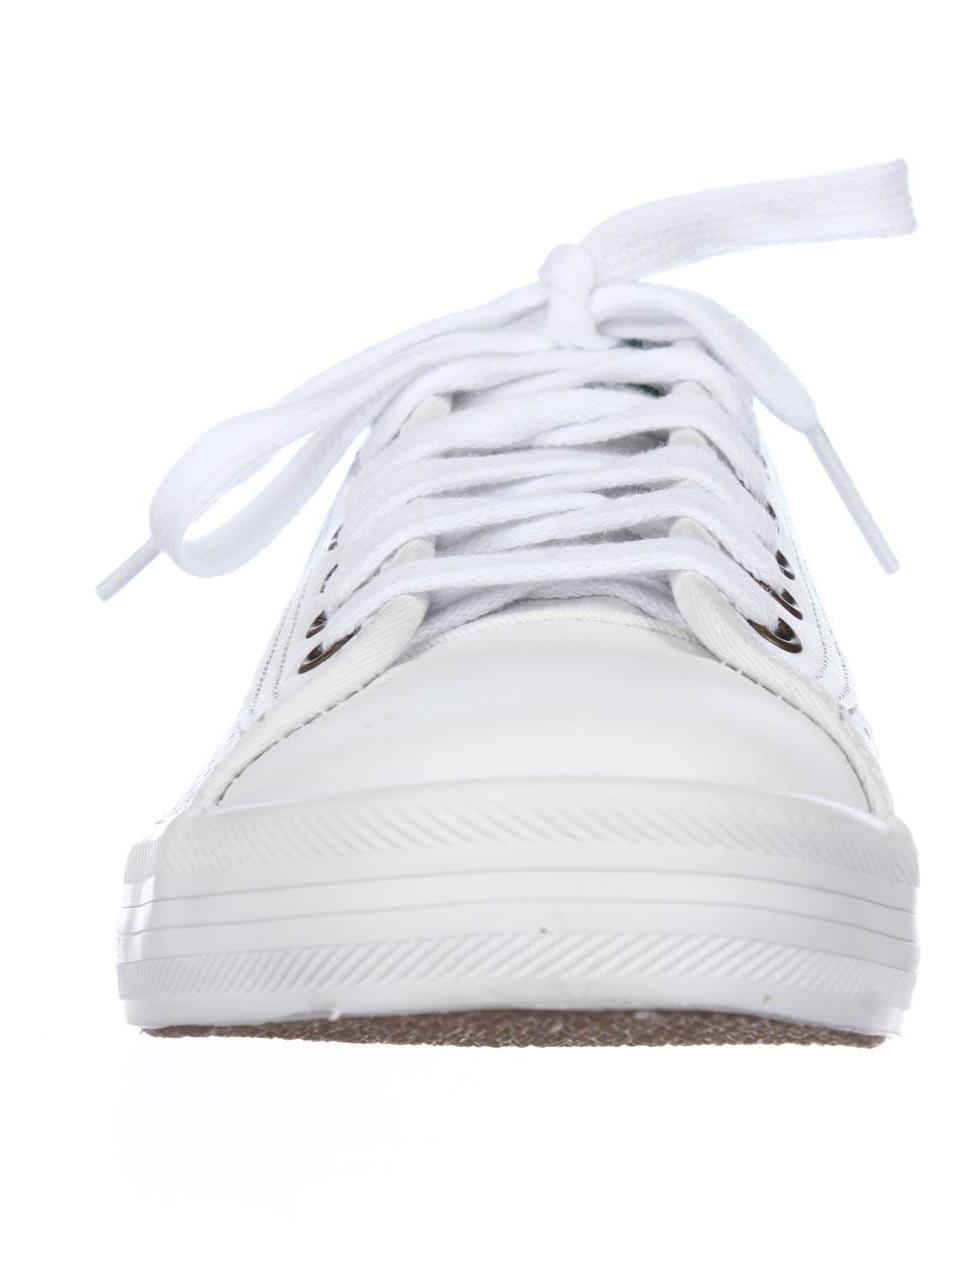 Keds Womens Kickstart Economical, stylish, and eye-catching shoes